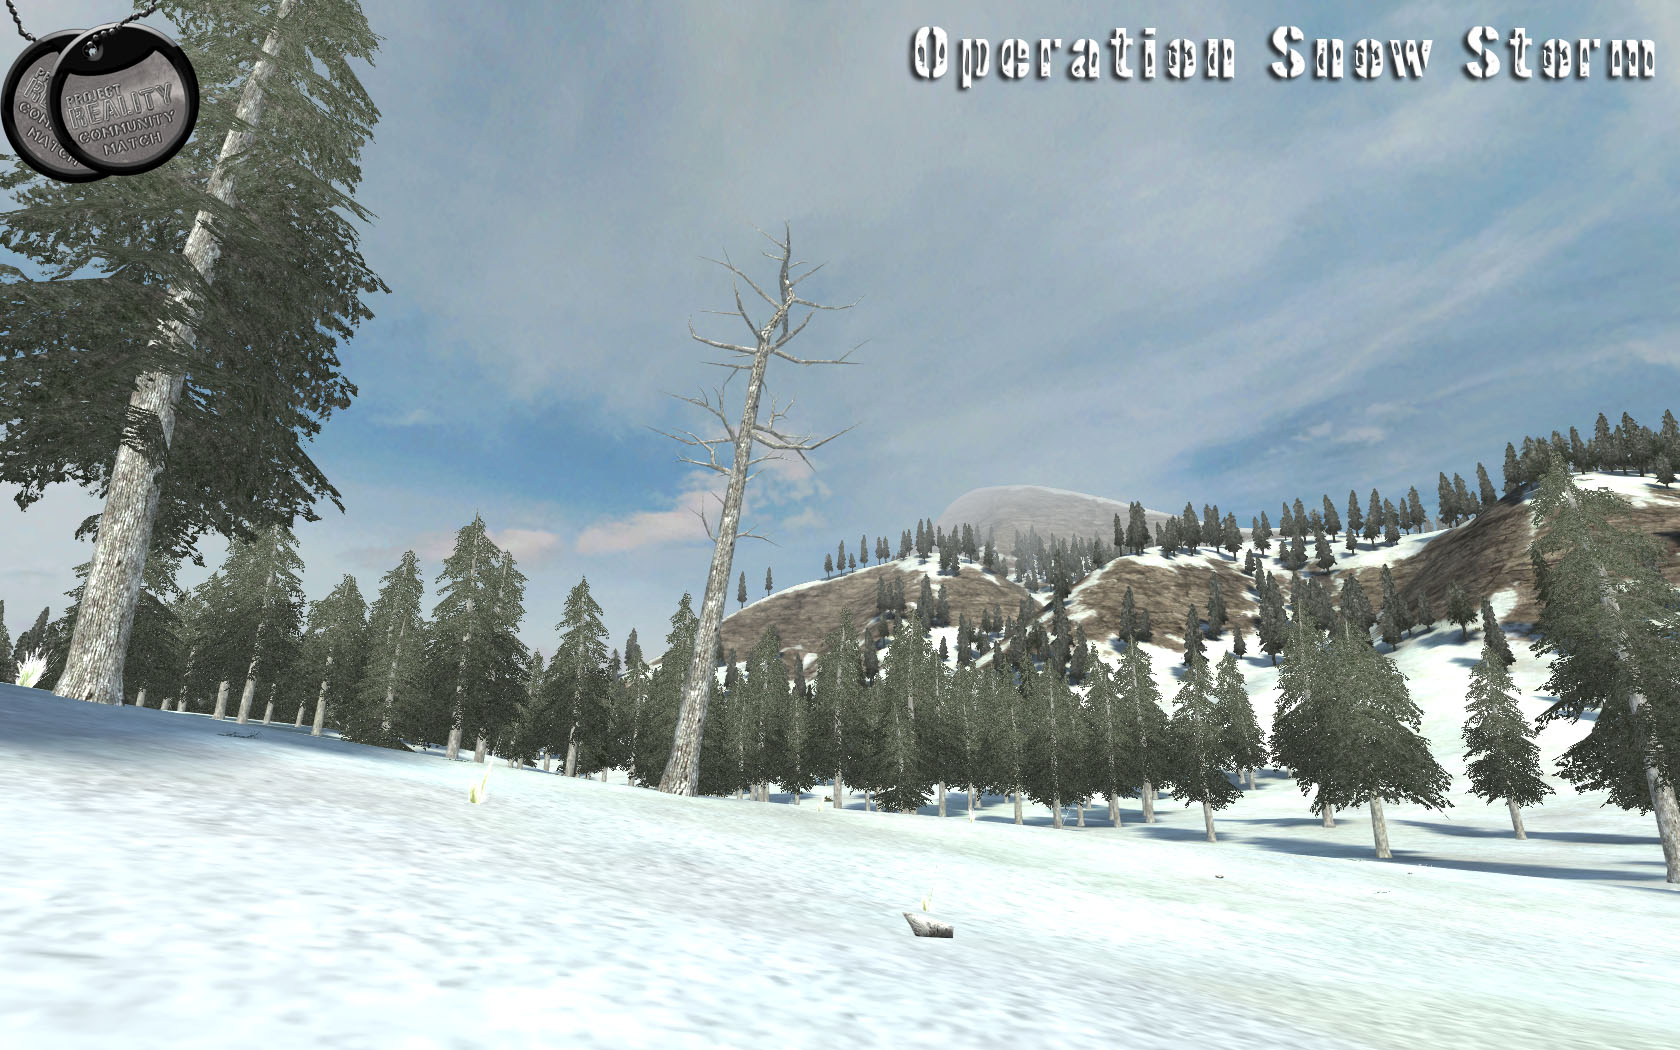 Operation Snow Storm! Oss2